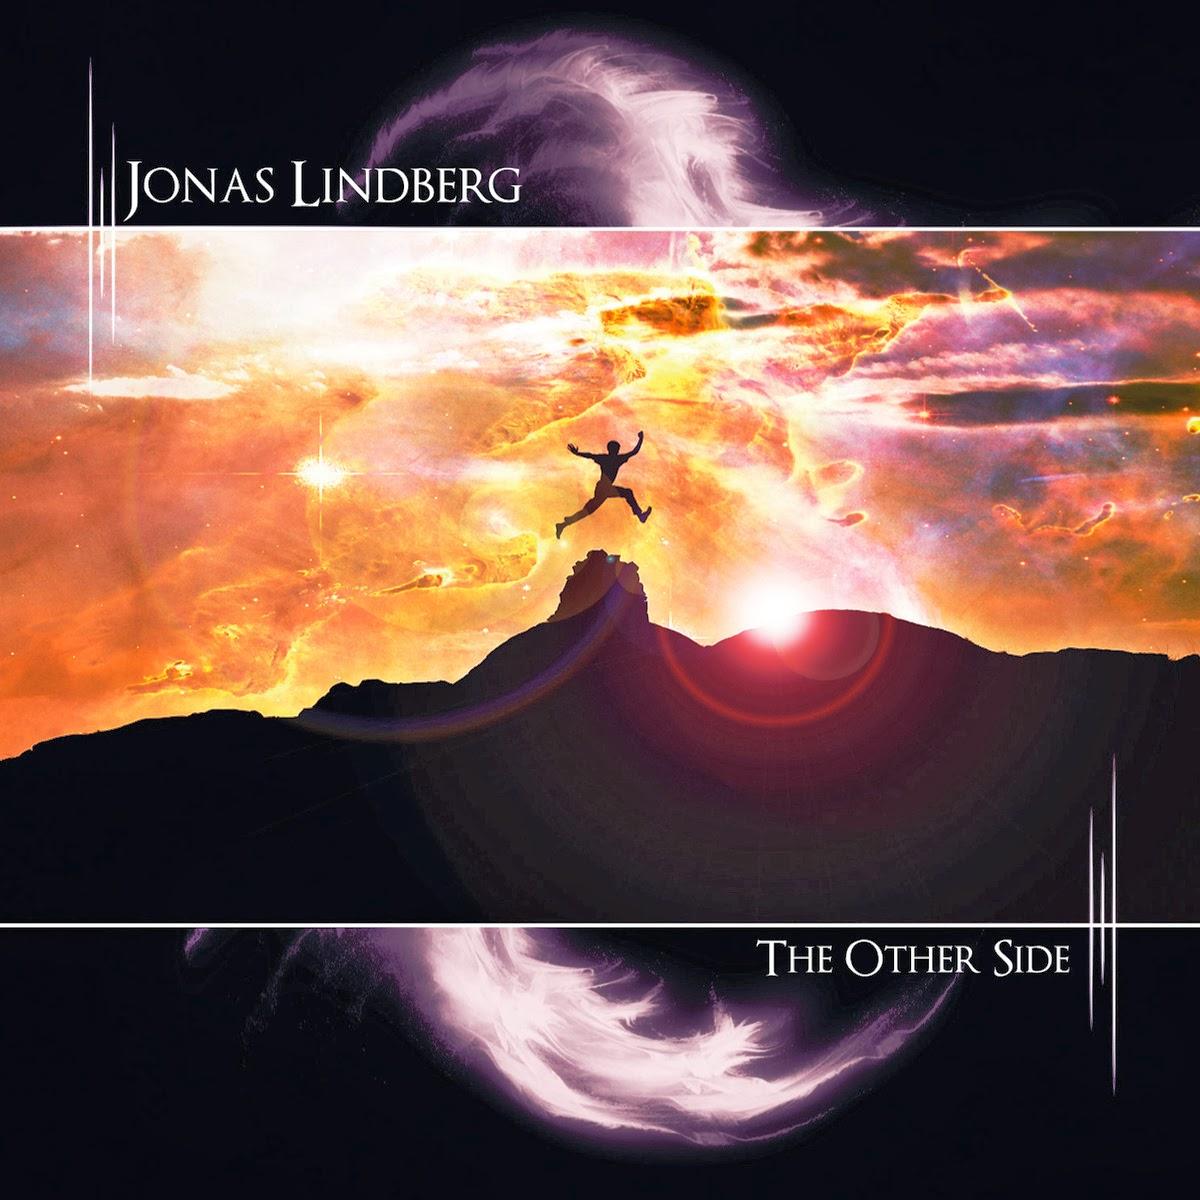 Jonas Lindberg - The other side